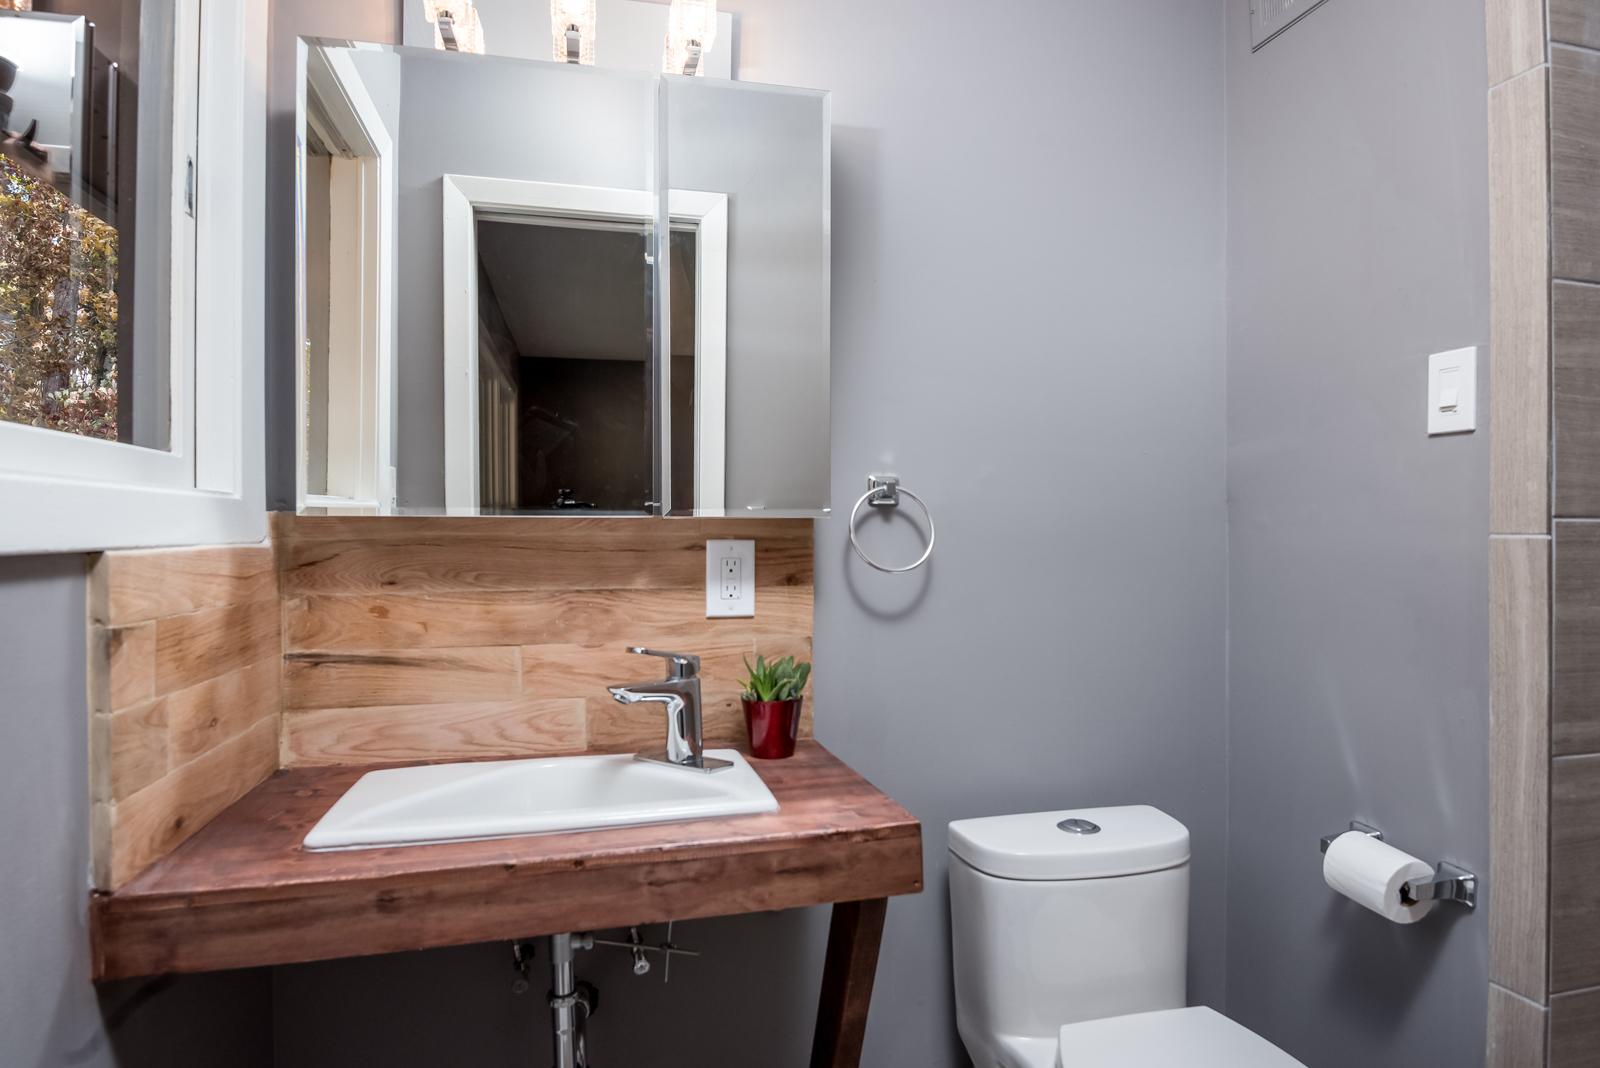 Custom Bathroom Vanities Charlotte Nc 1000 river oaks lane • modern charlotte, nc homes for sale | mid